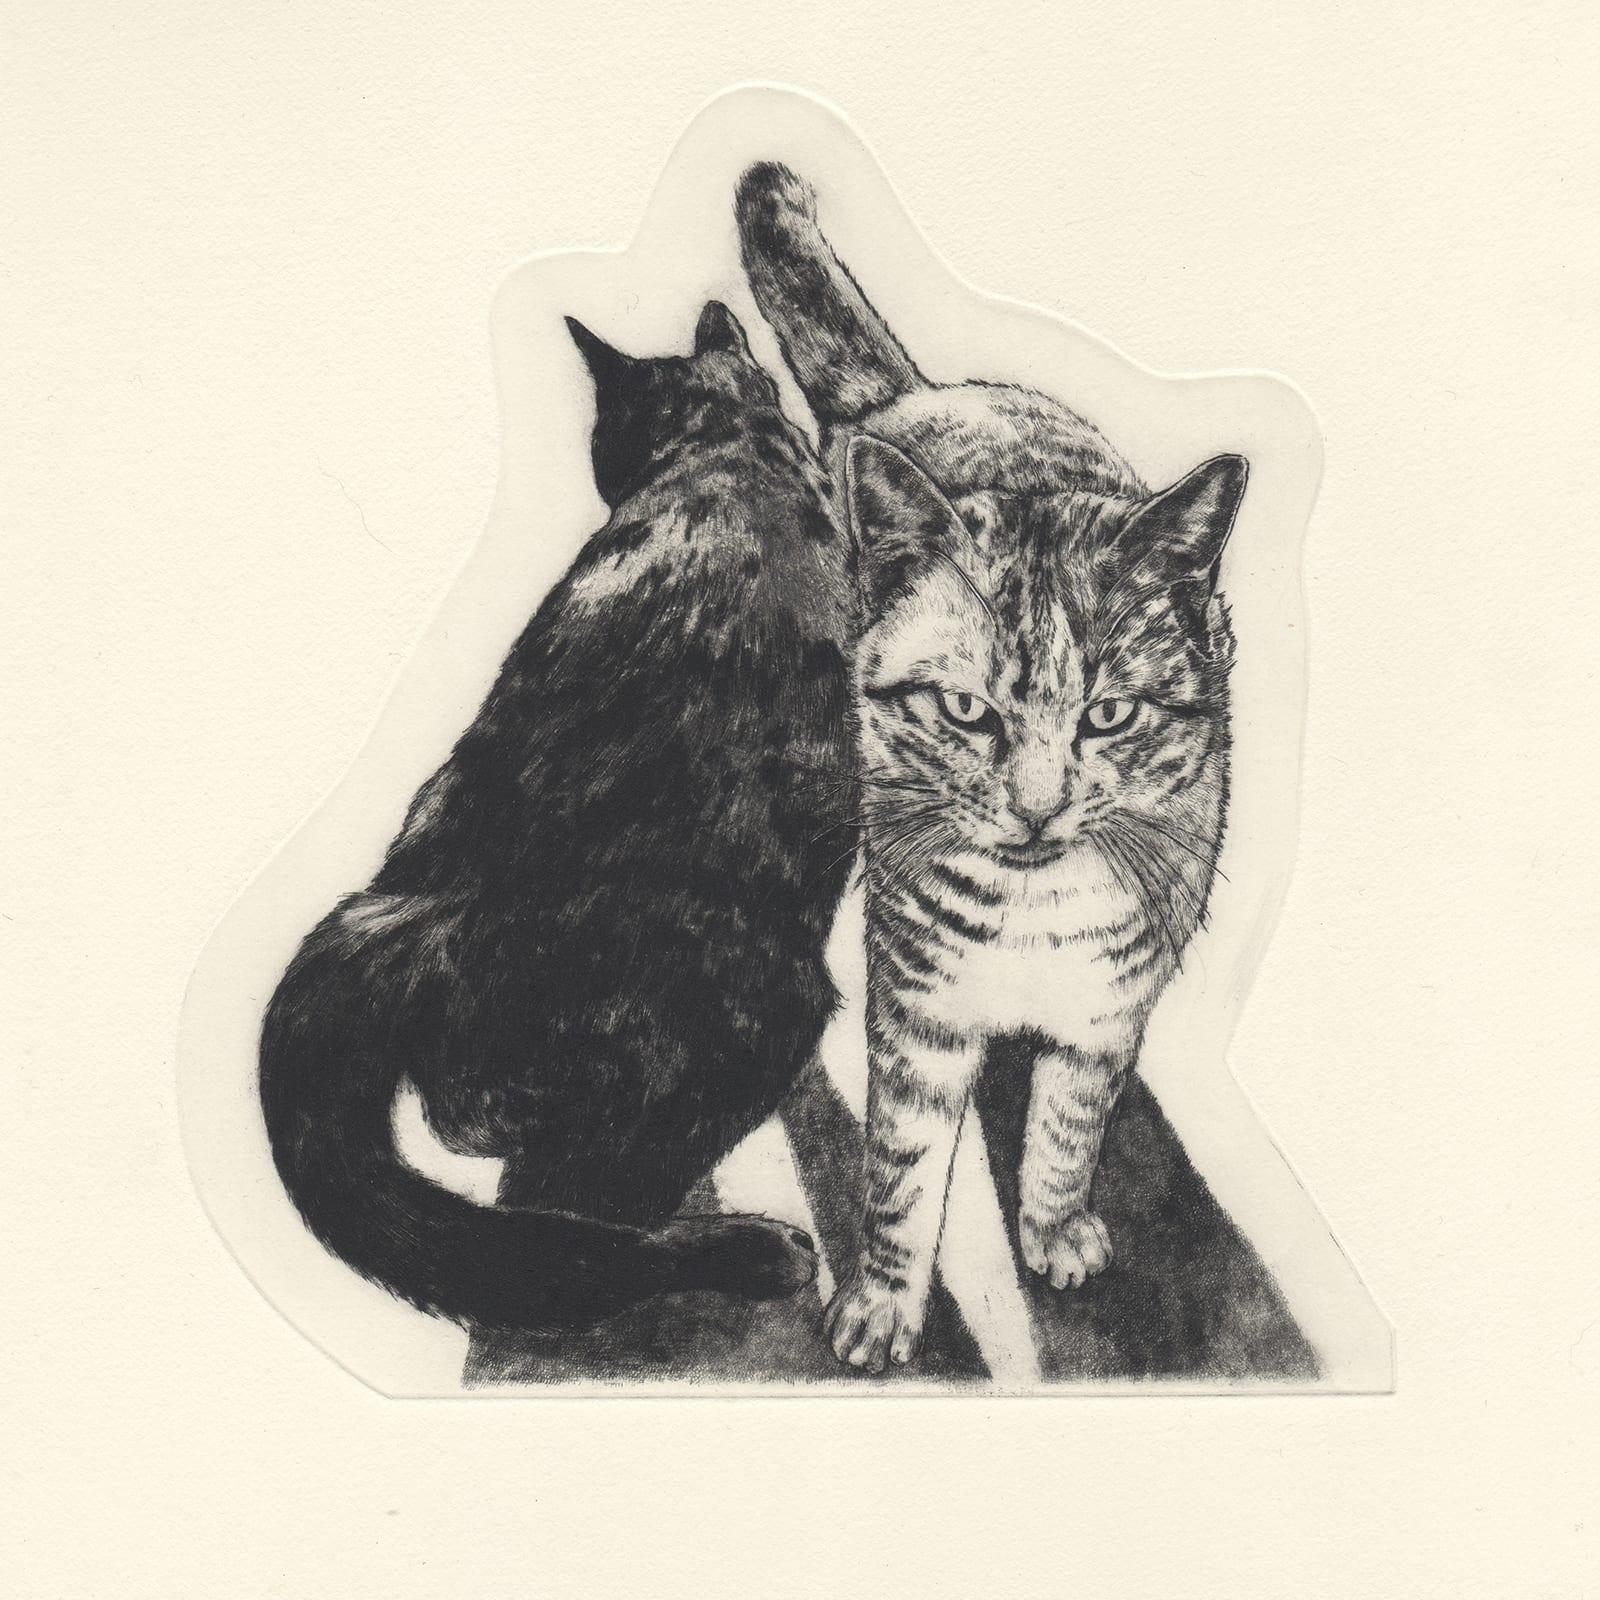 Friends (drypoint etching by Yaemi Shigyo)